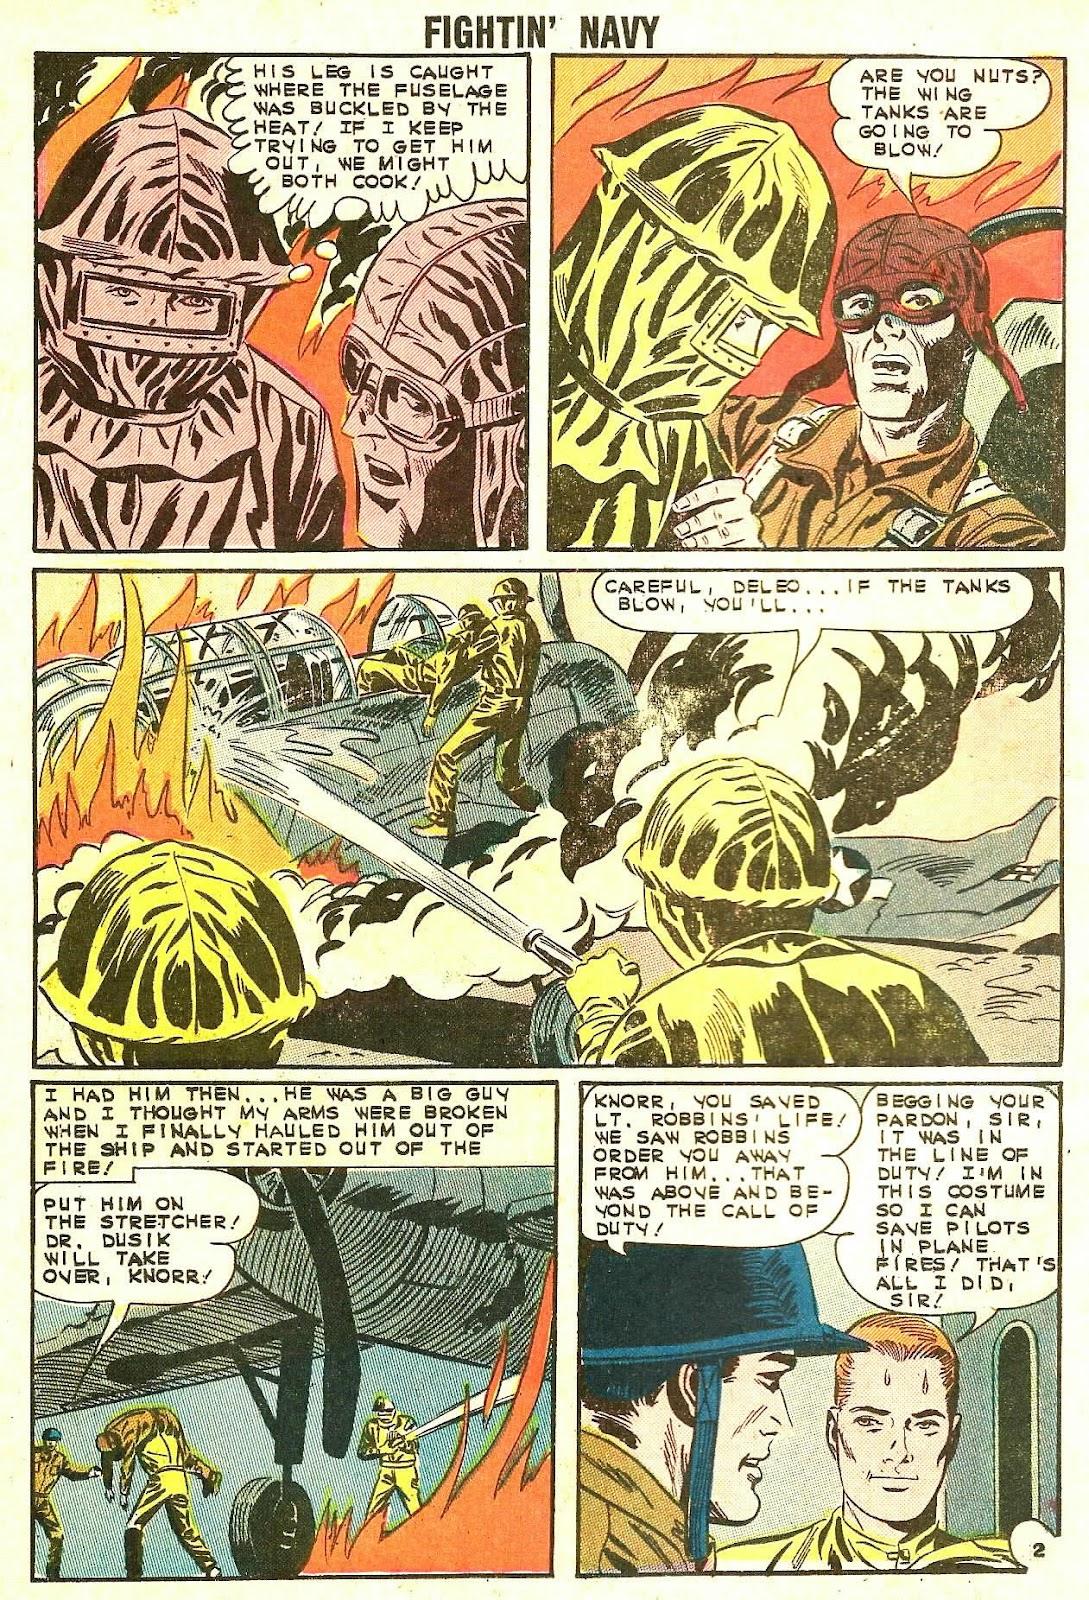 Read online Fightin' Navy comic -  Issue #114 - 26